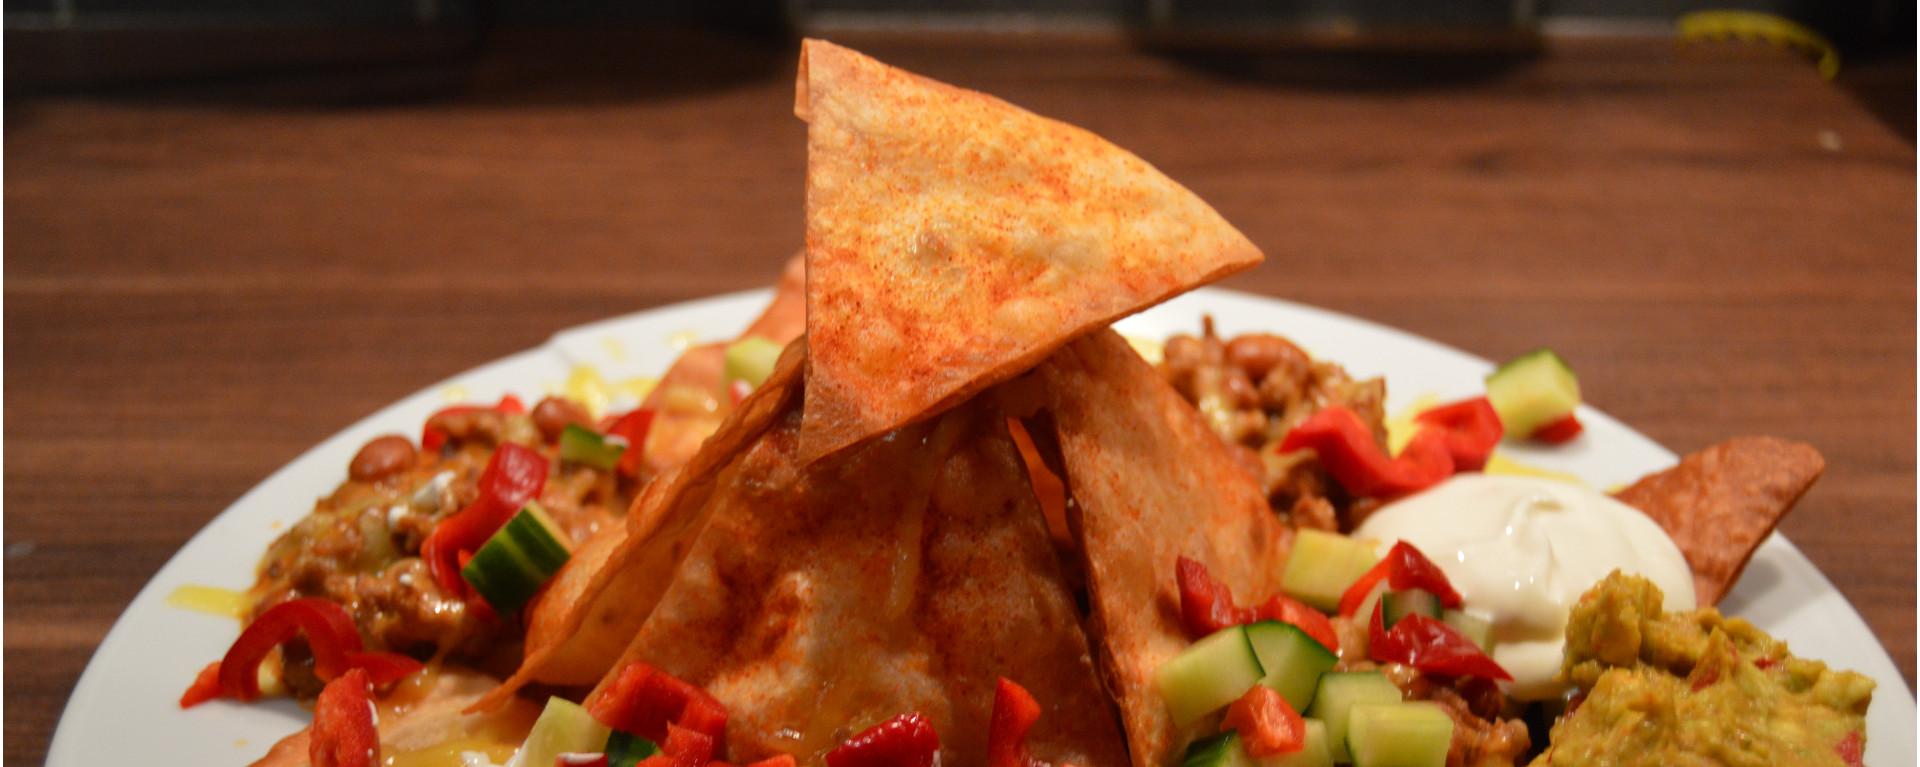 ChefNorway's Amazing Nachos